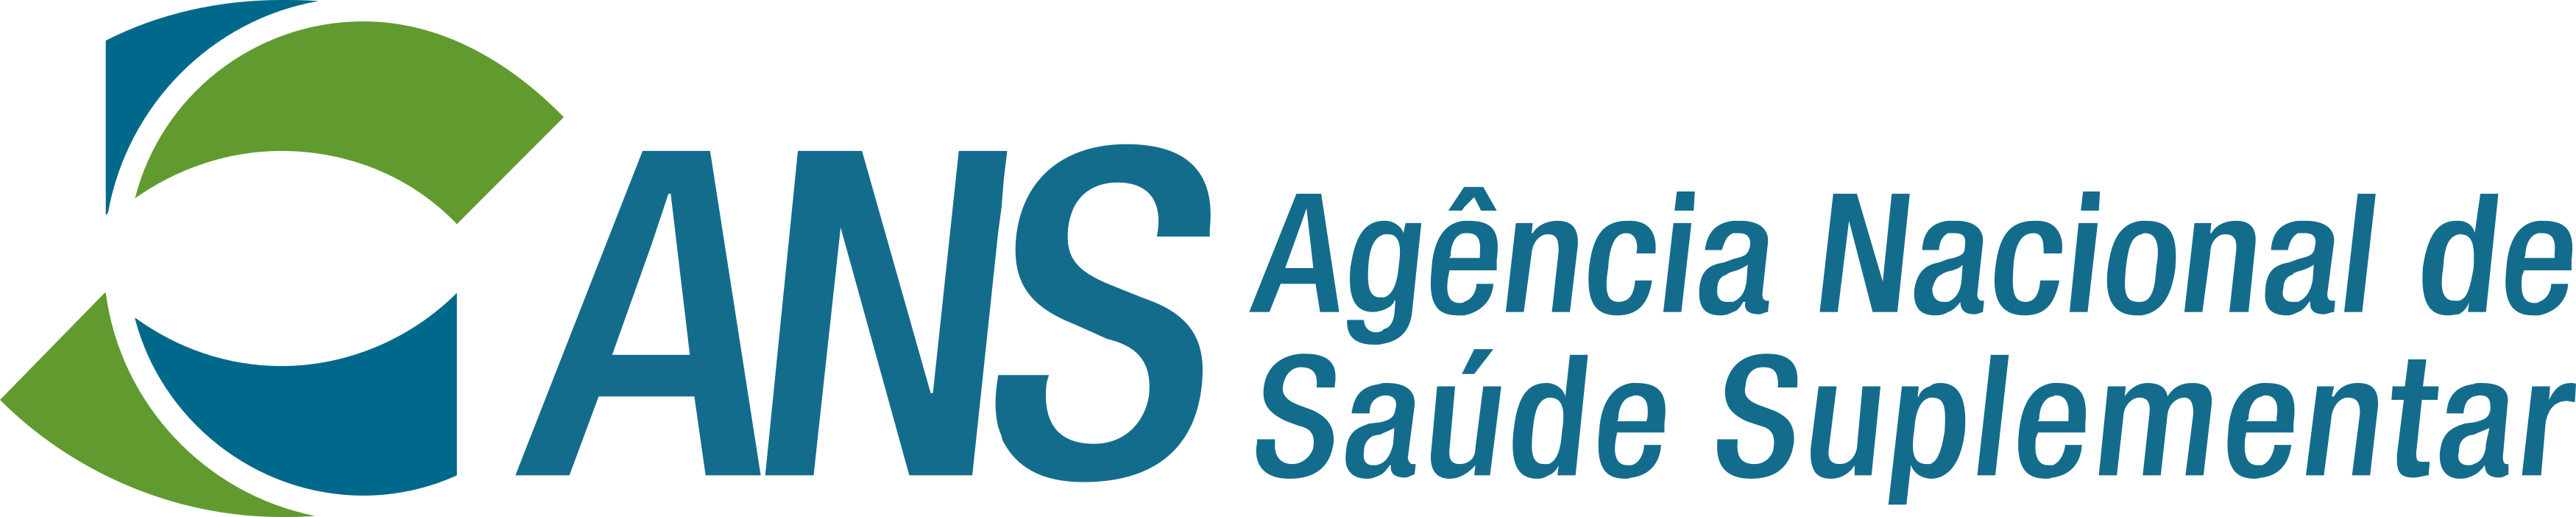 ANS Logo.